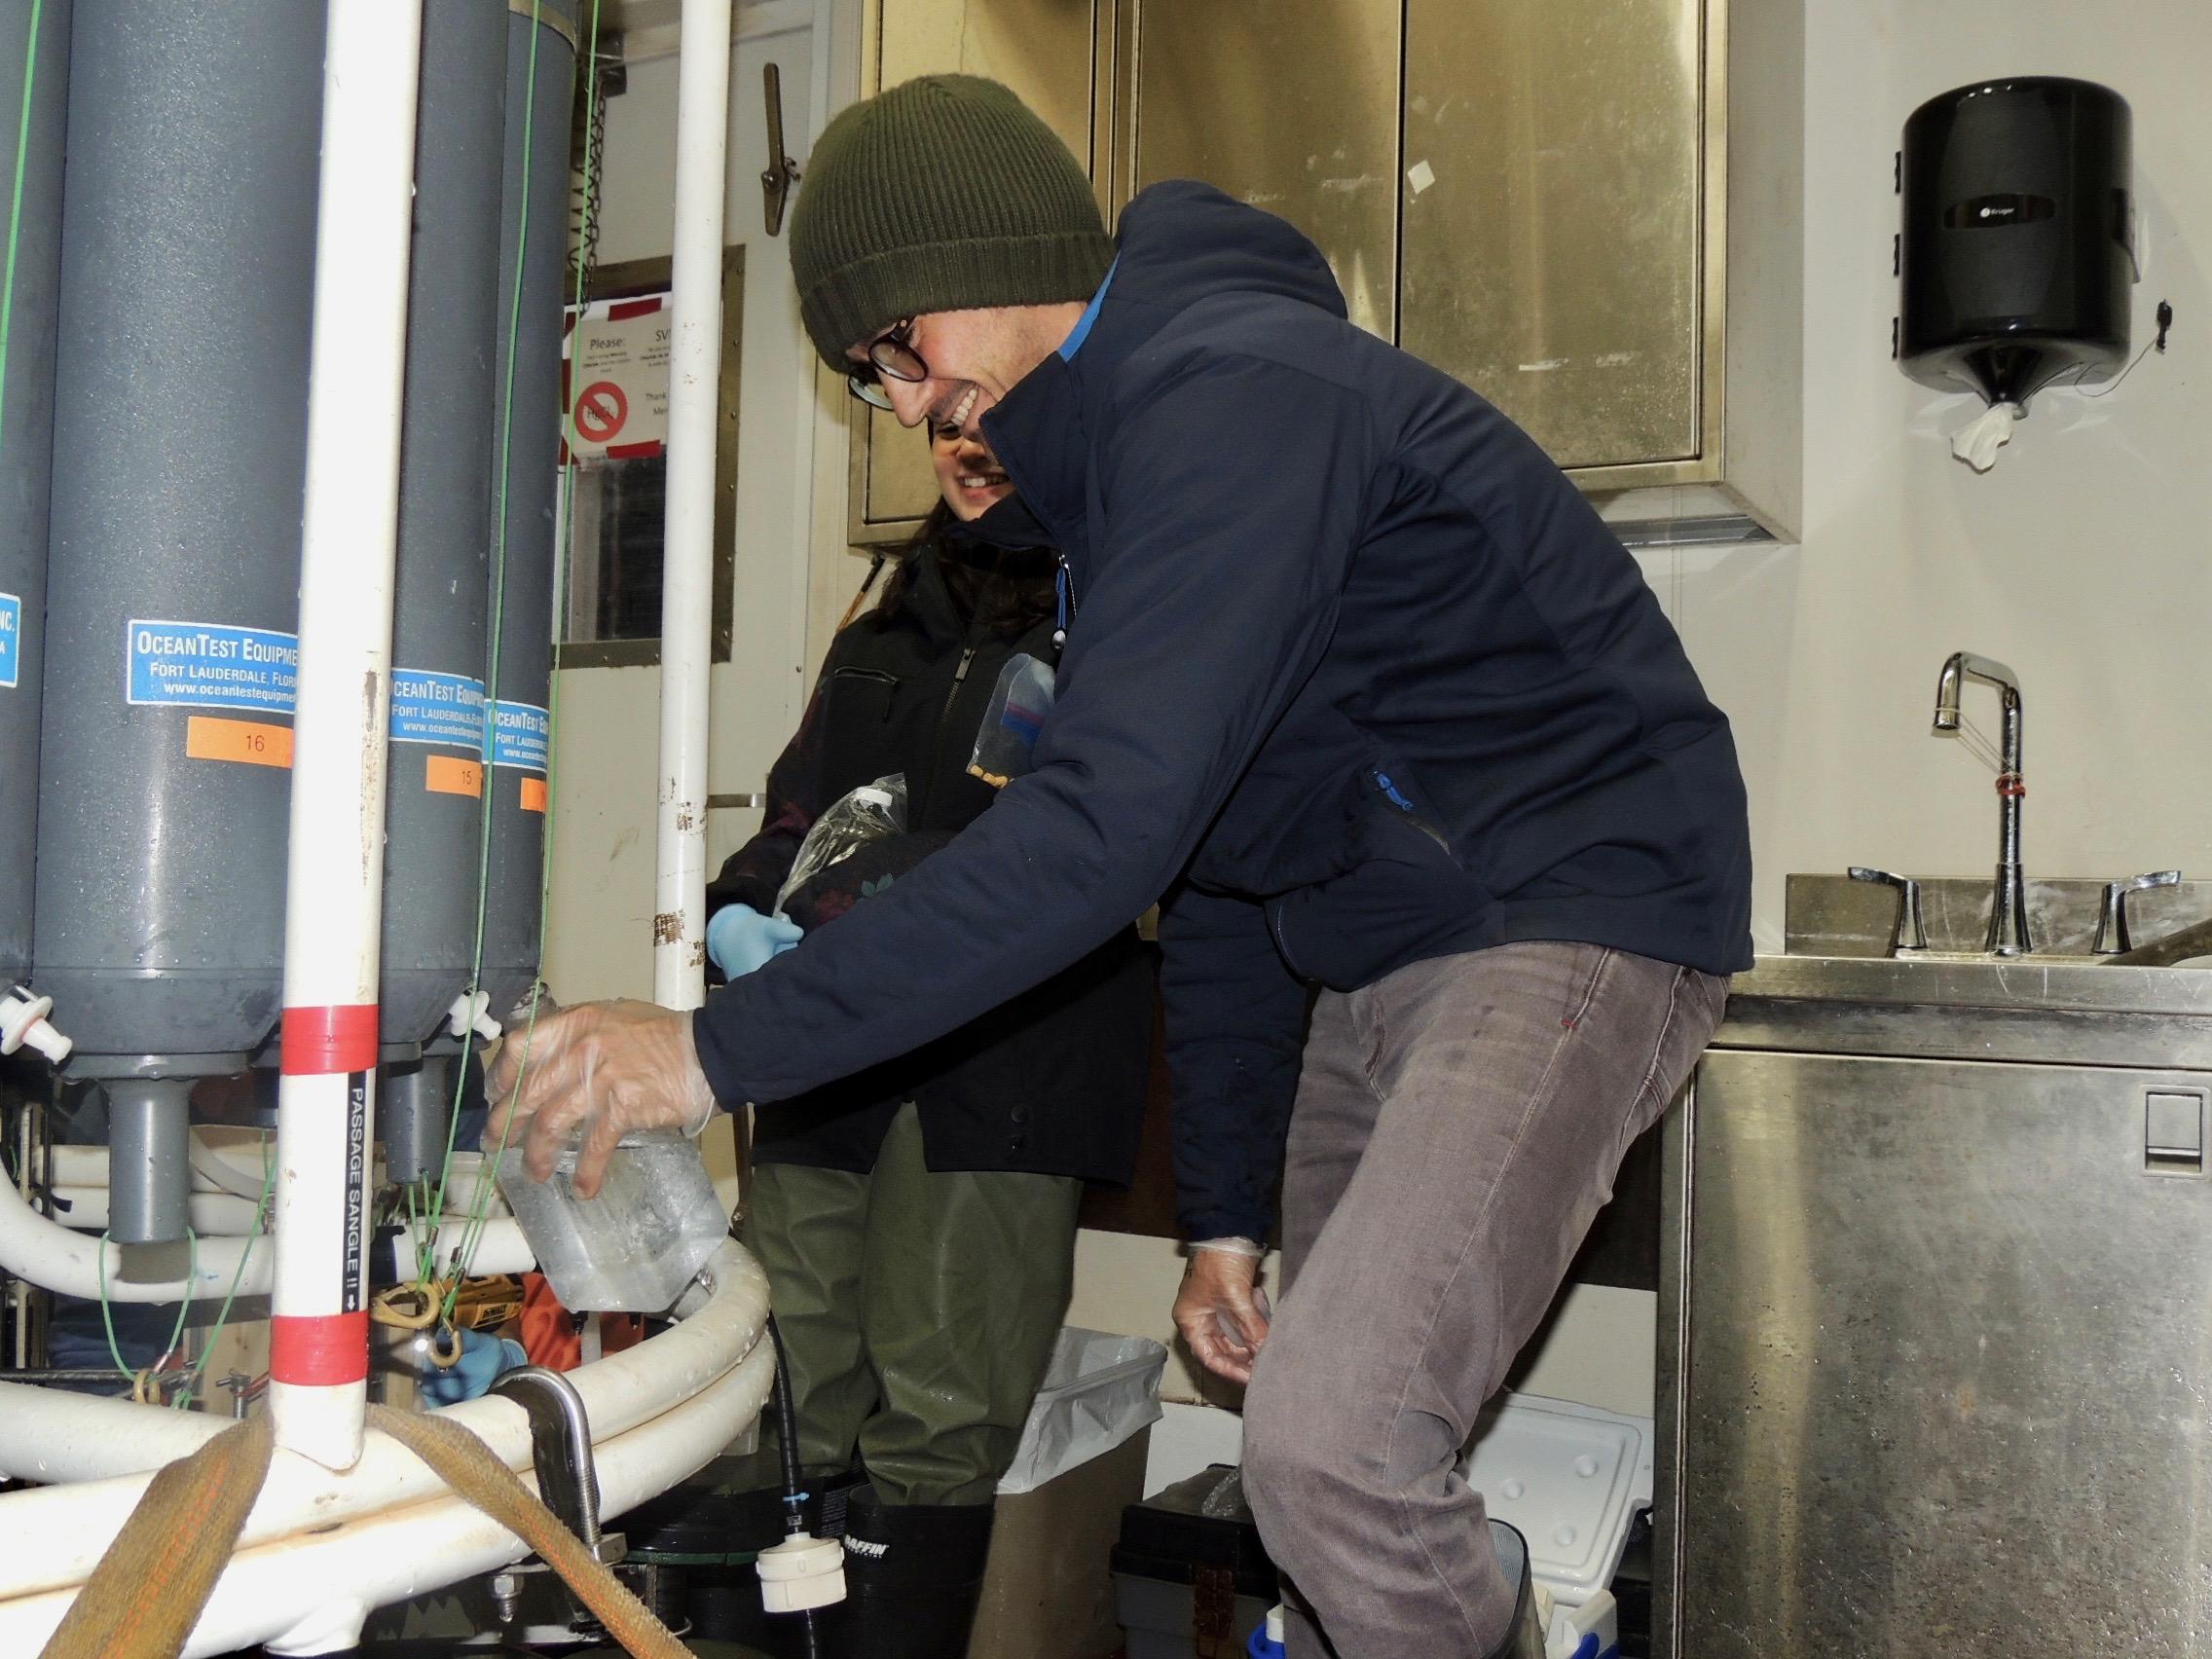 ARCTIC WATER MASSES DISTINGUISHED USING RADIUM ISOTOPES